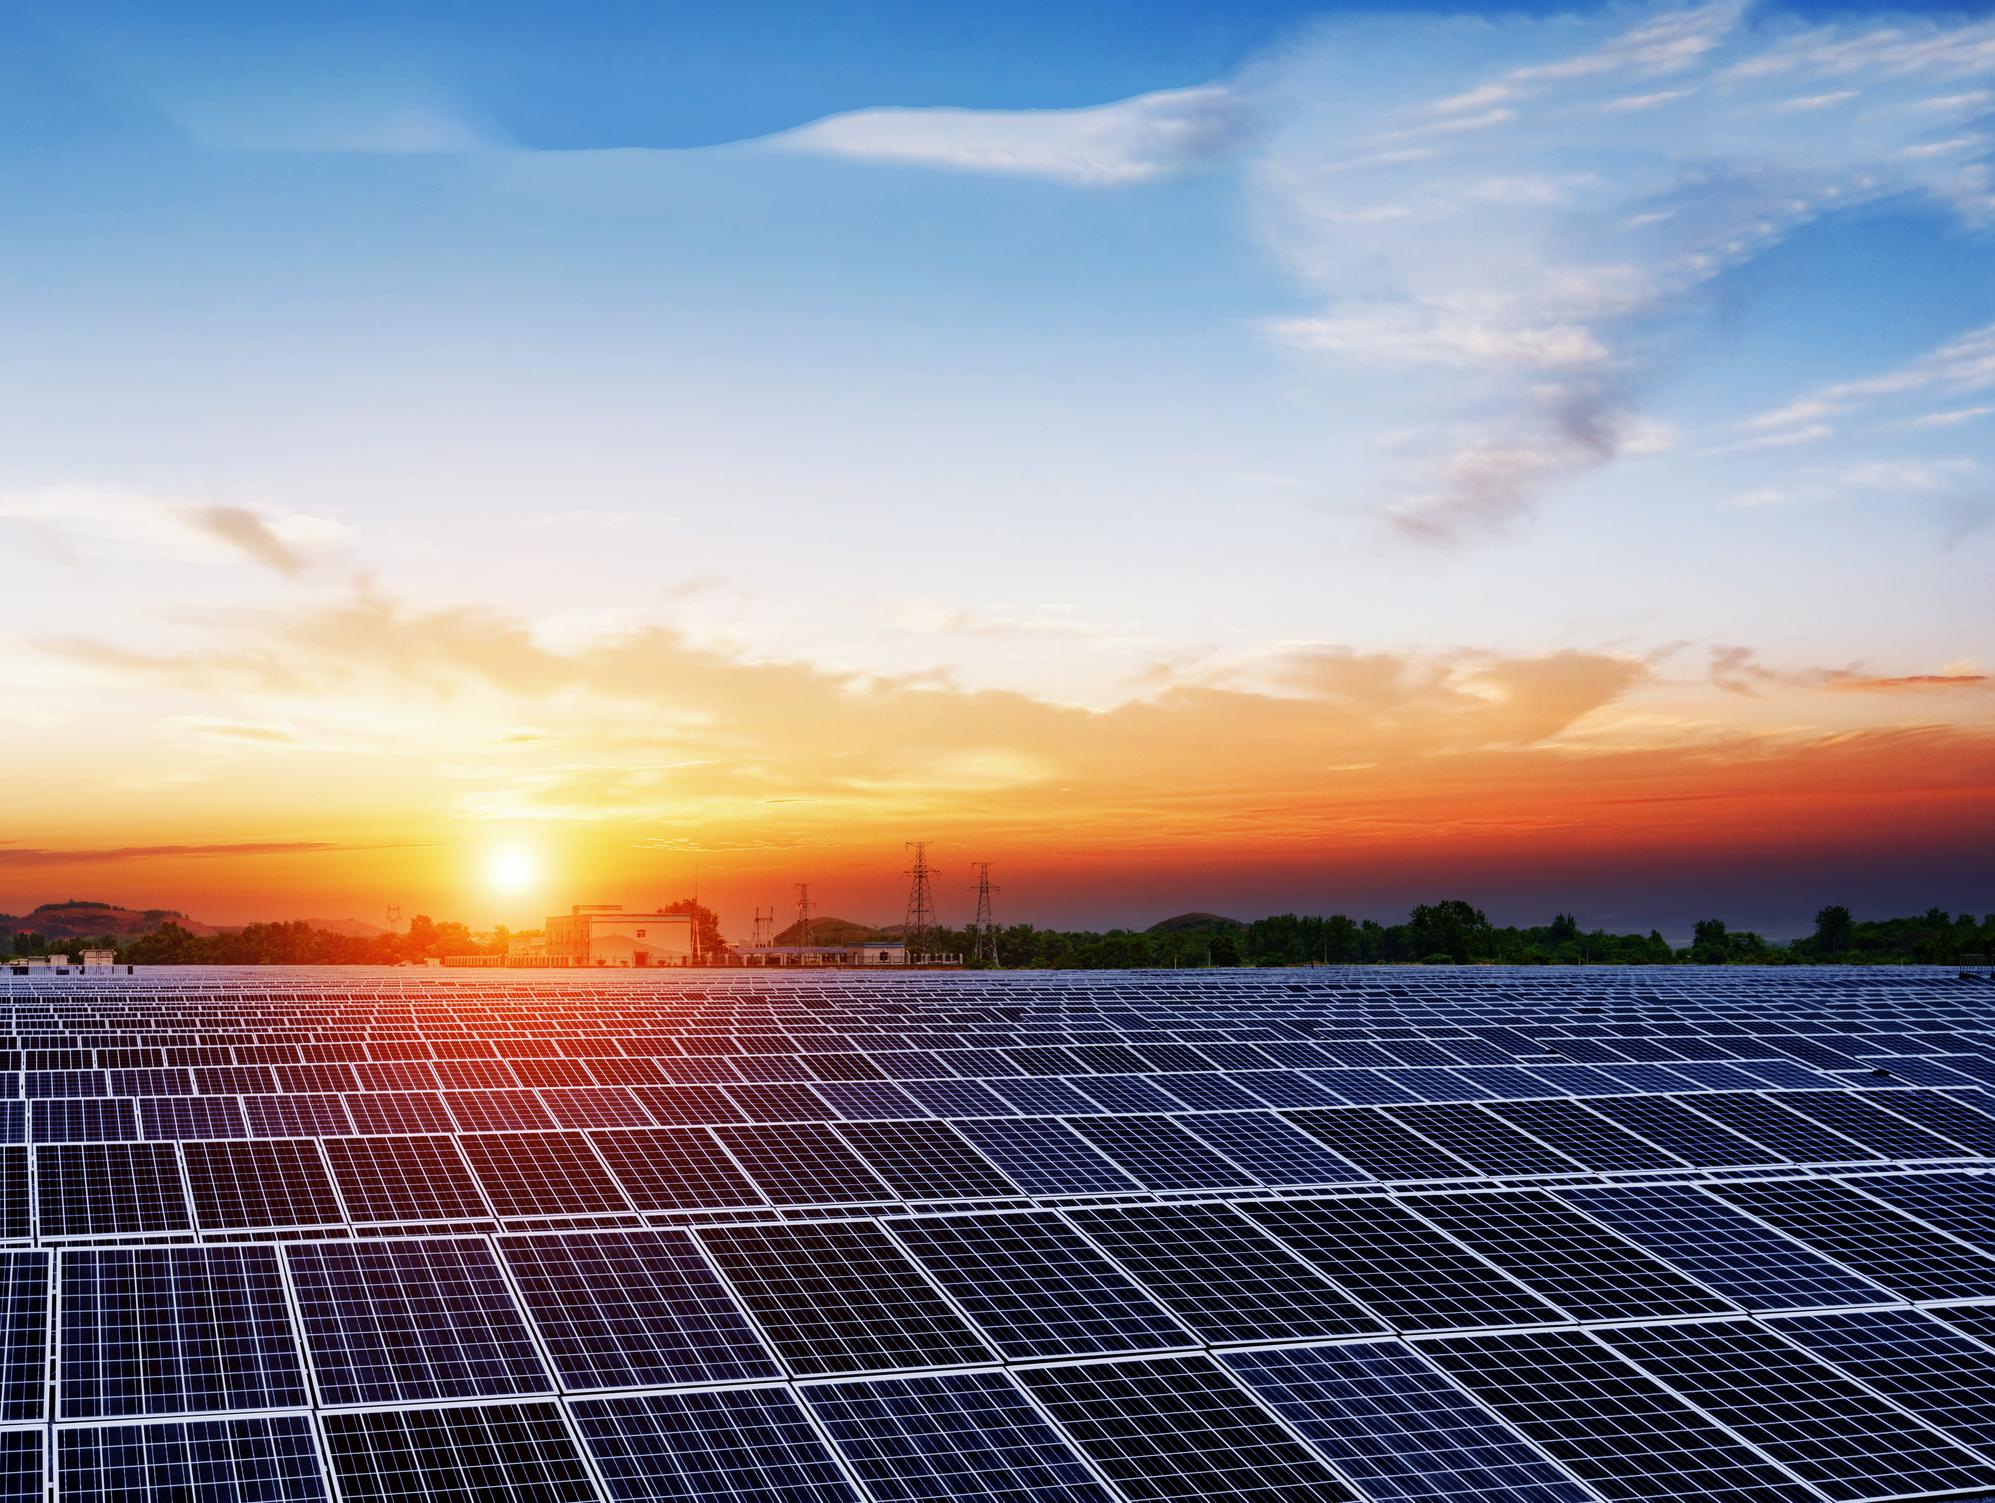 Sun rising over an array of solar panels